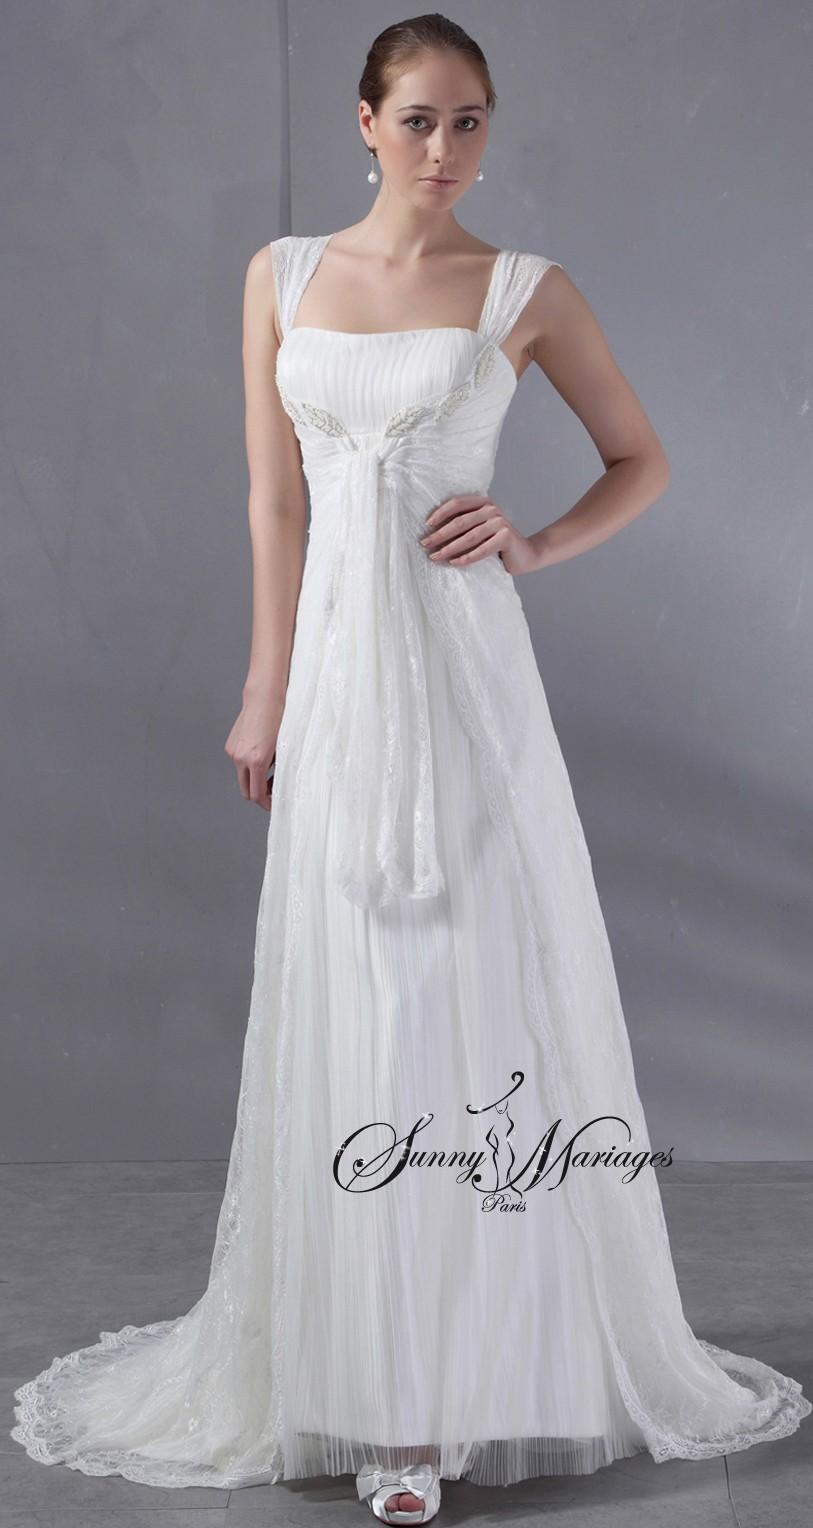 ... robe de mariée » robe de mariée empire boheme hippy chic « Romane